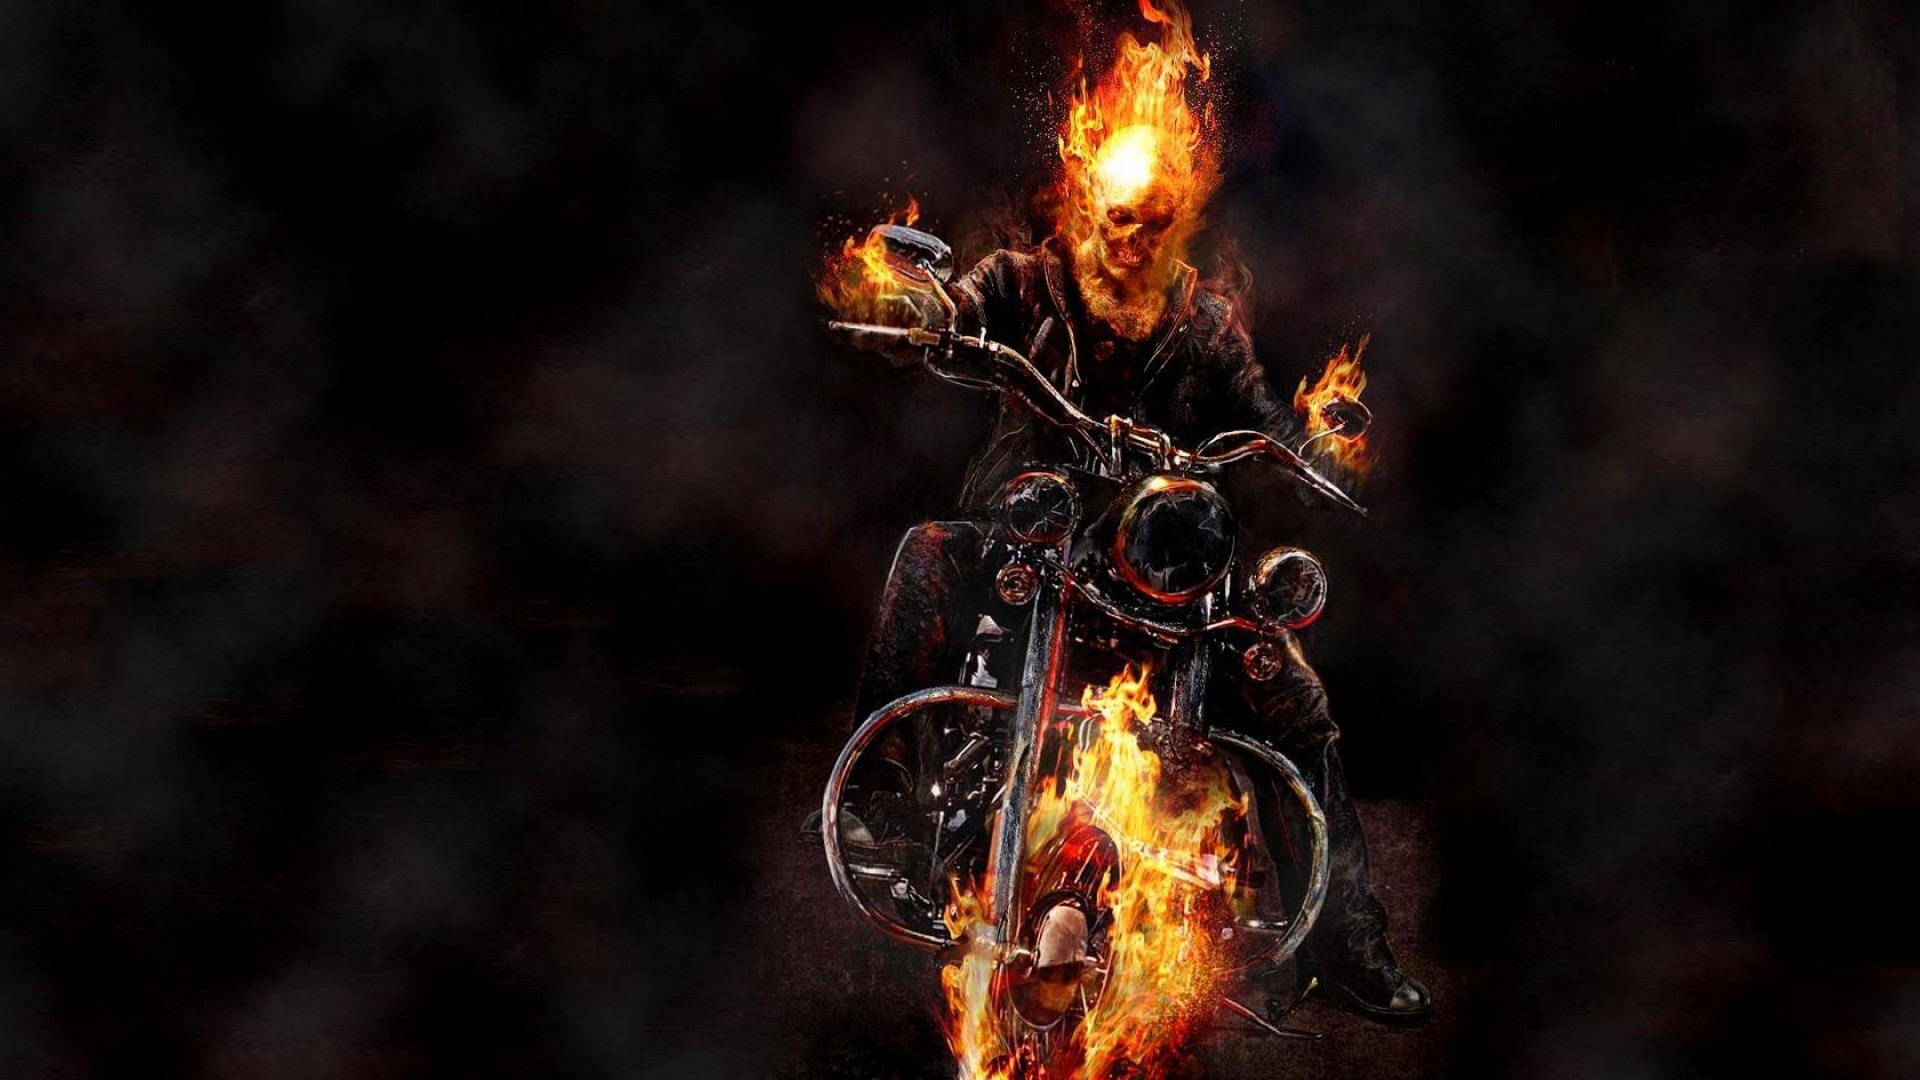 Mad Max Fury Road HD desktop wallpaper Widescreen High | HD Wallpapers |  Pinterest | Mad max and Wallpaper